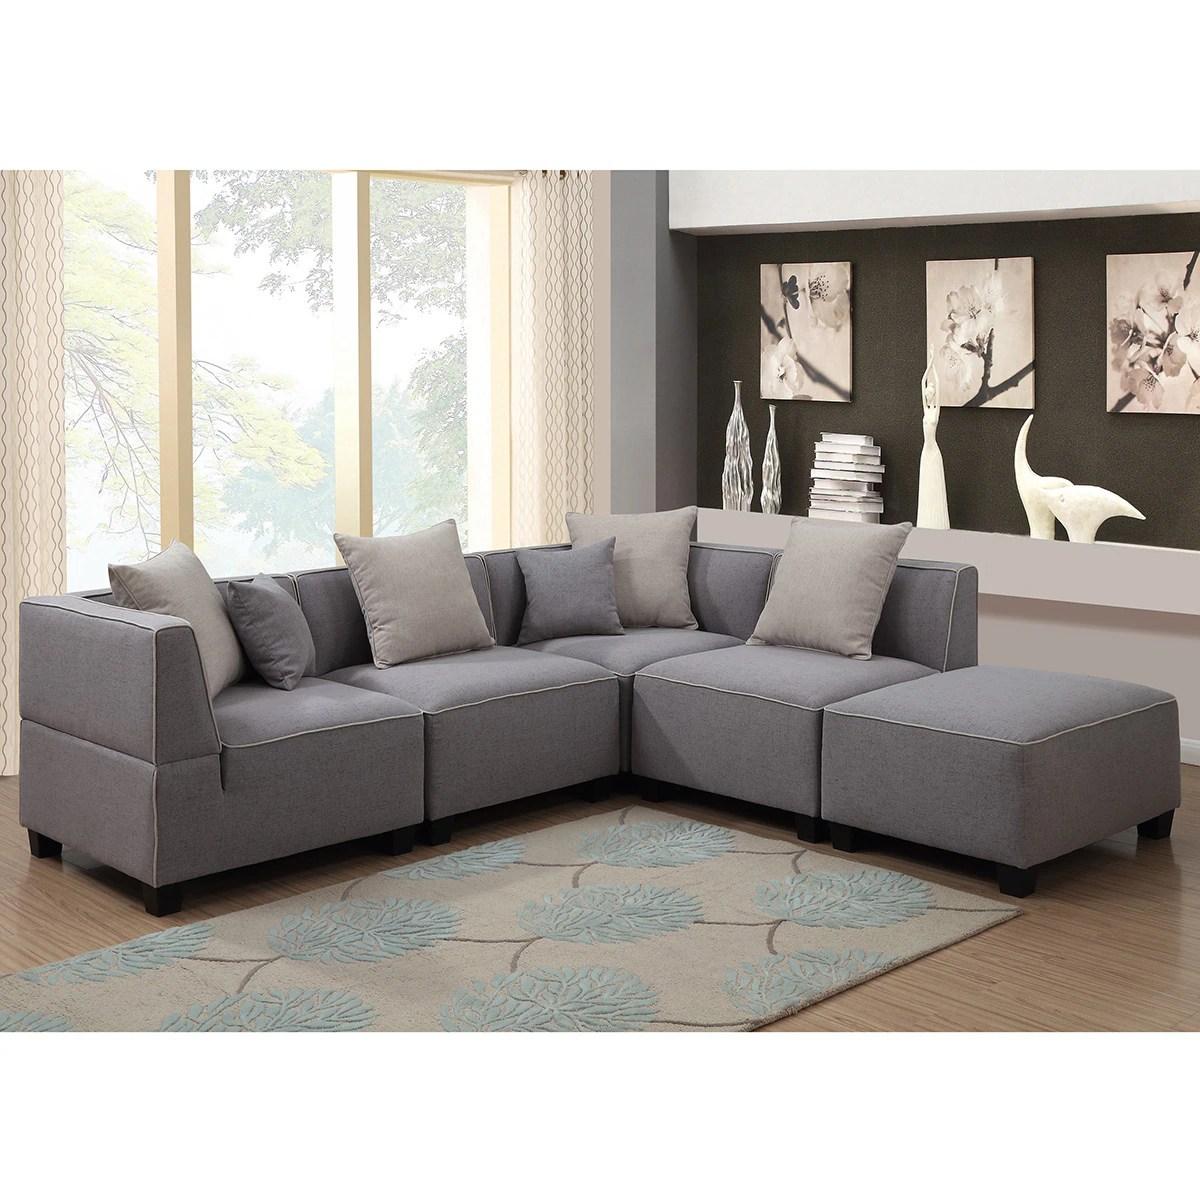 holly modern 5 piece modular grey linen l shaped sectional